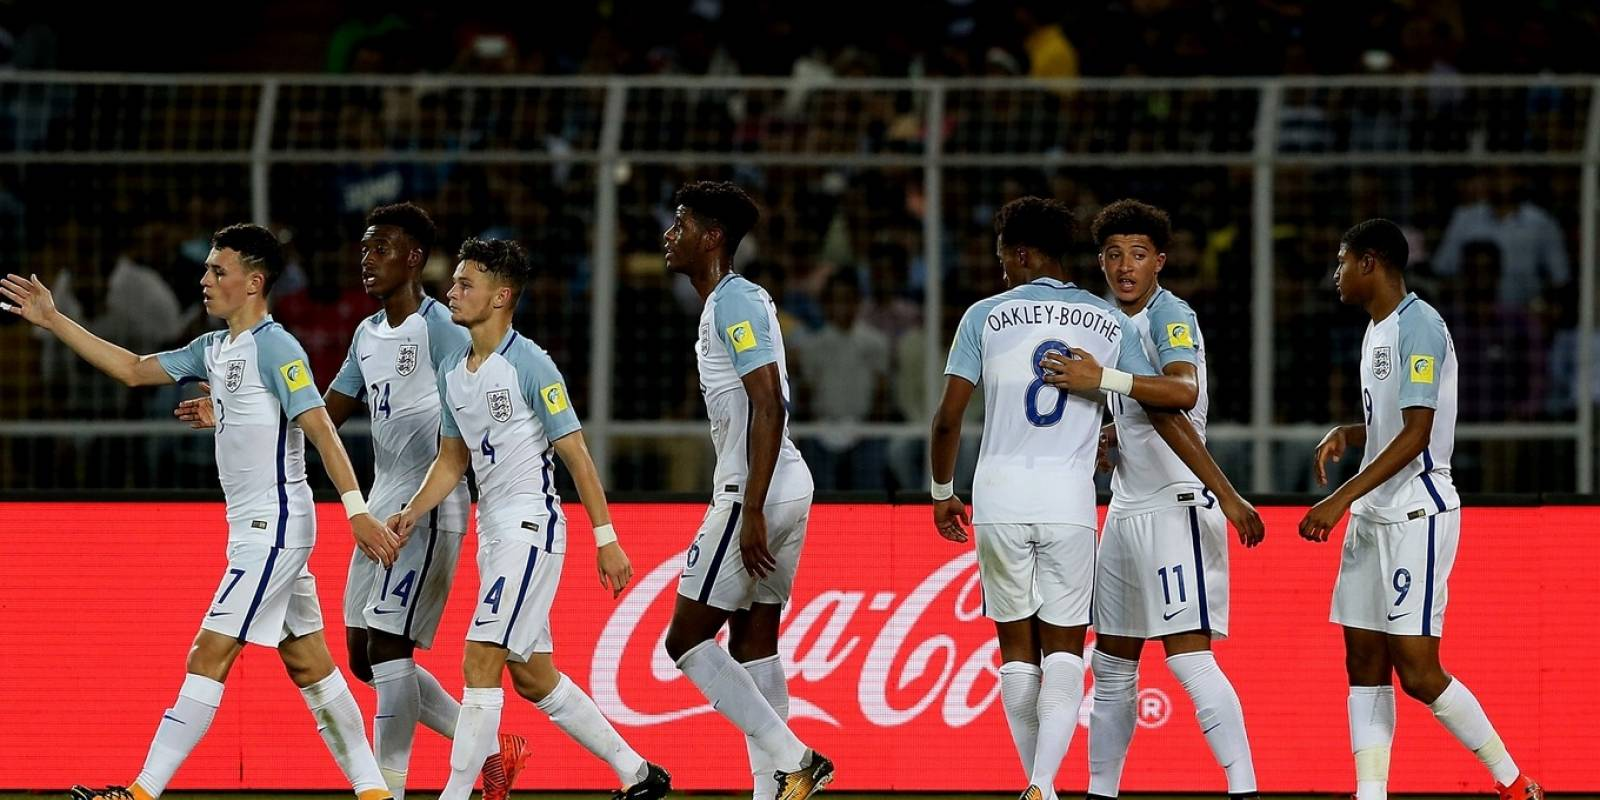 El equipo inglés se mostró sólido y brilló al ritmo de Jadon Sancho (11) / Foto: fifa.com